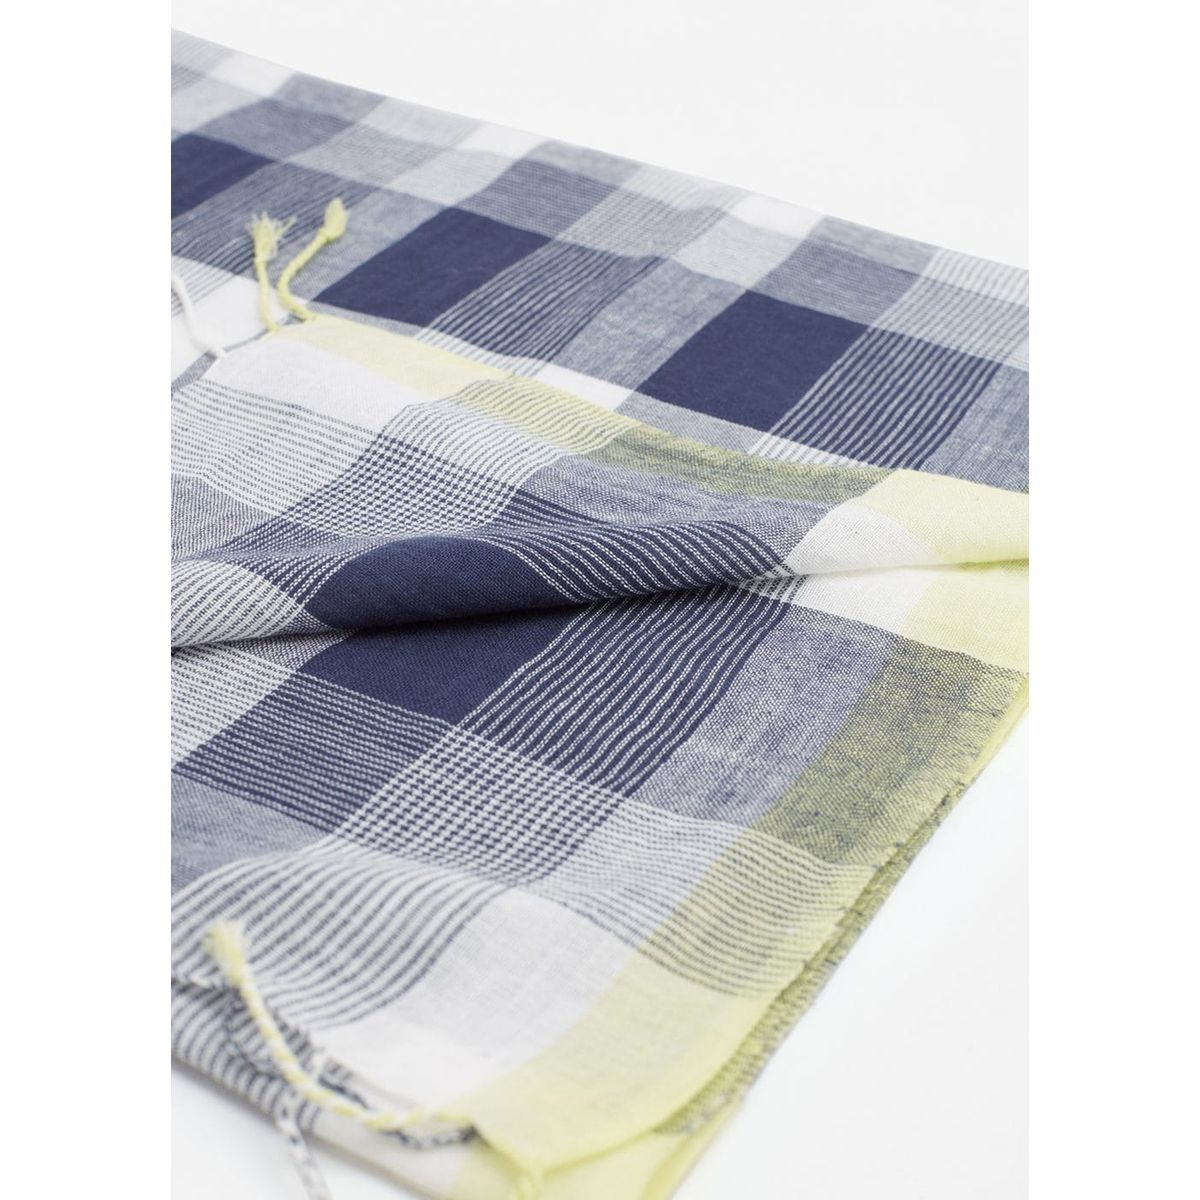 Foulard coton à carreaux bleu marine foncé Mango Kids   La Redoute ... 4fb545f9cd3